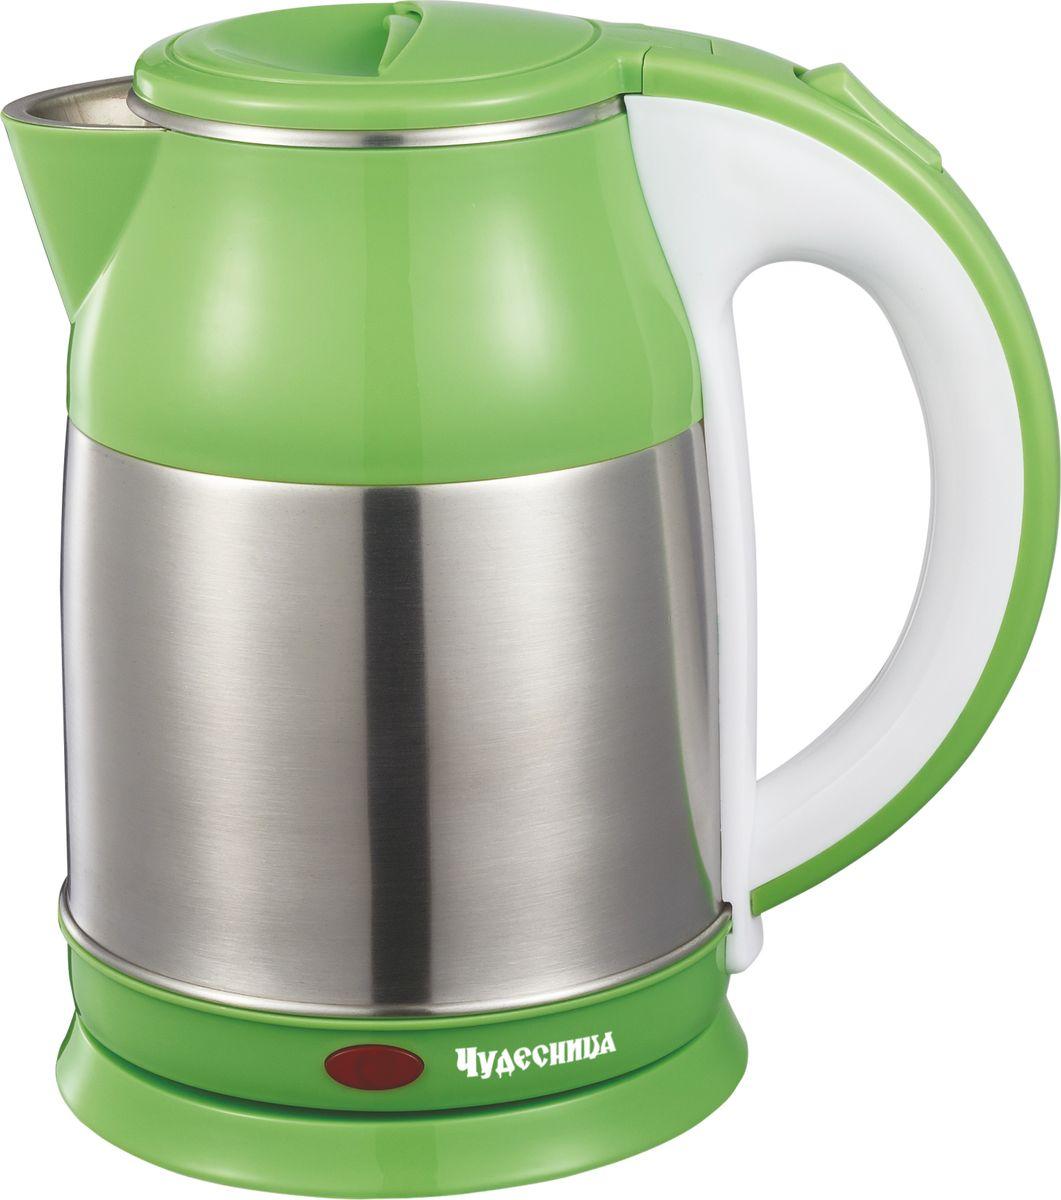 Чудесница ЭЧ-2015, Green чайник электрический цена и фото